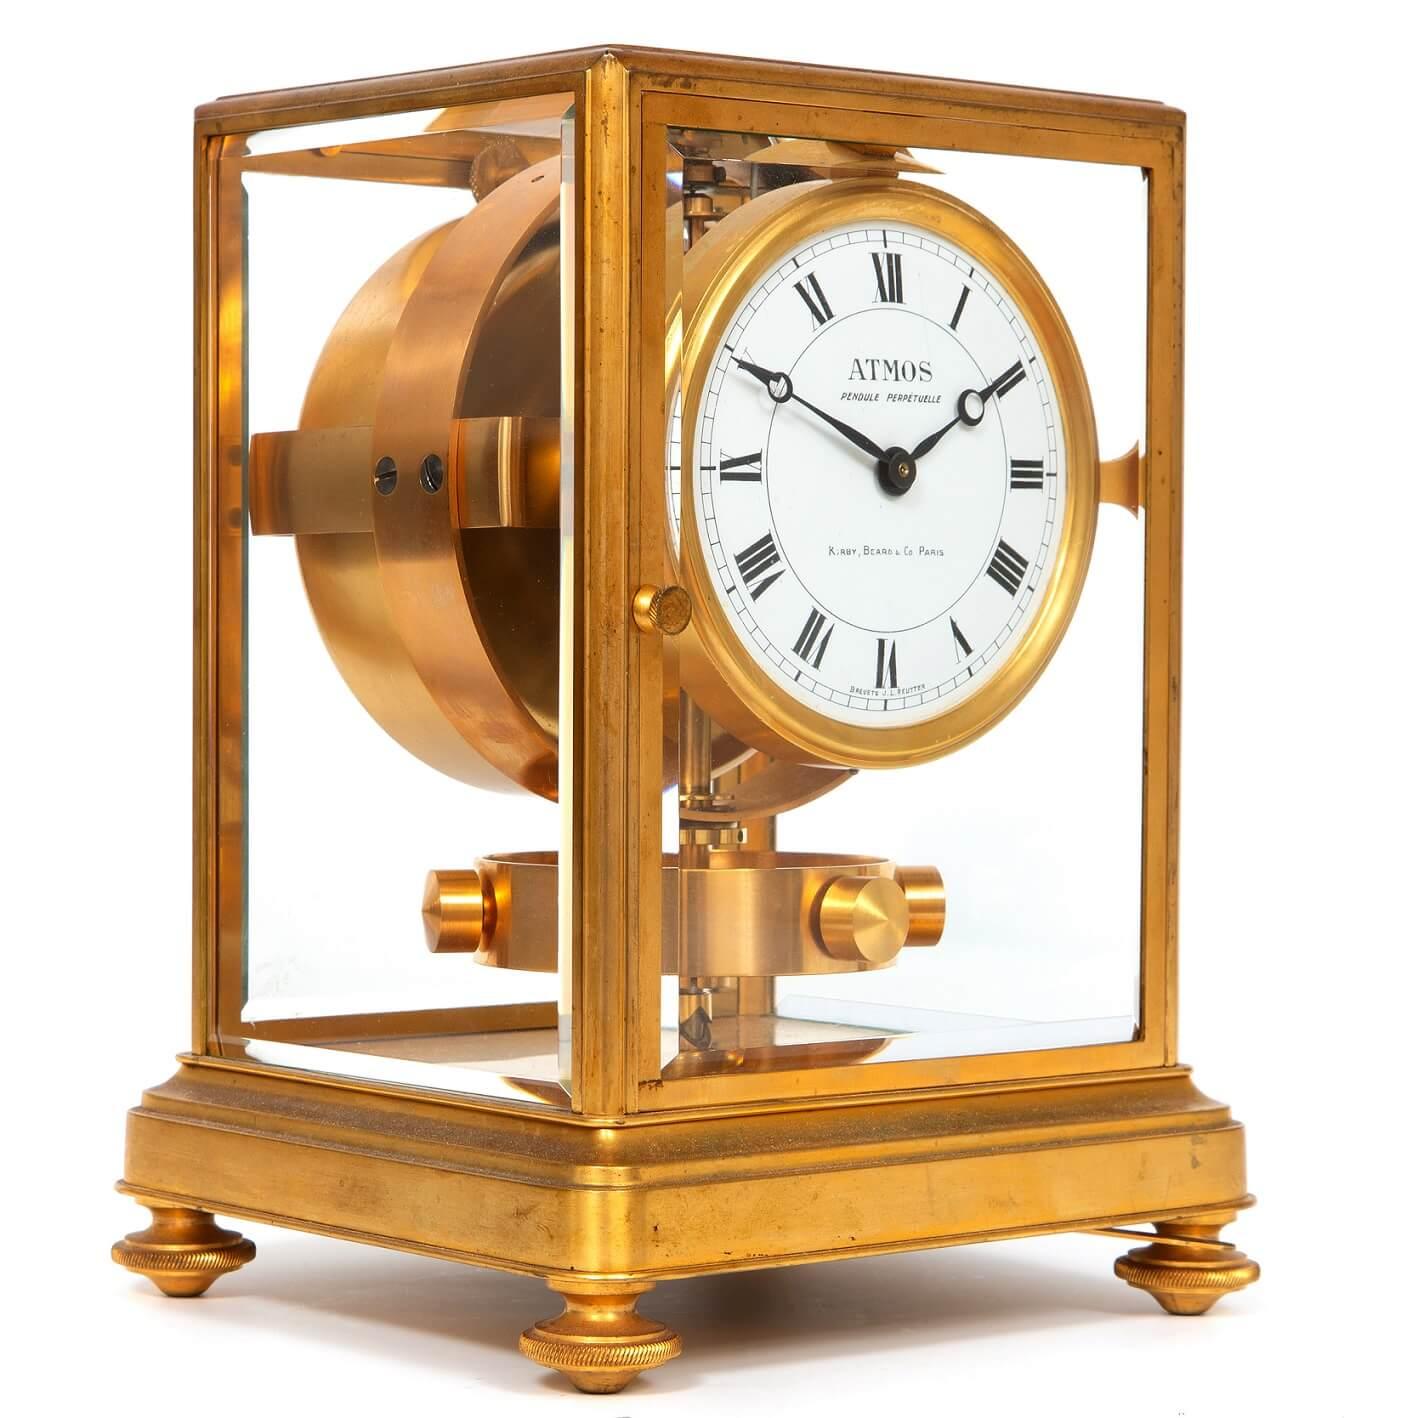 French-Swiss-art-deco-gilt-brass-jean-leon-reutter-atmos-perpetual-antique-clock-